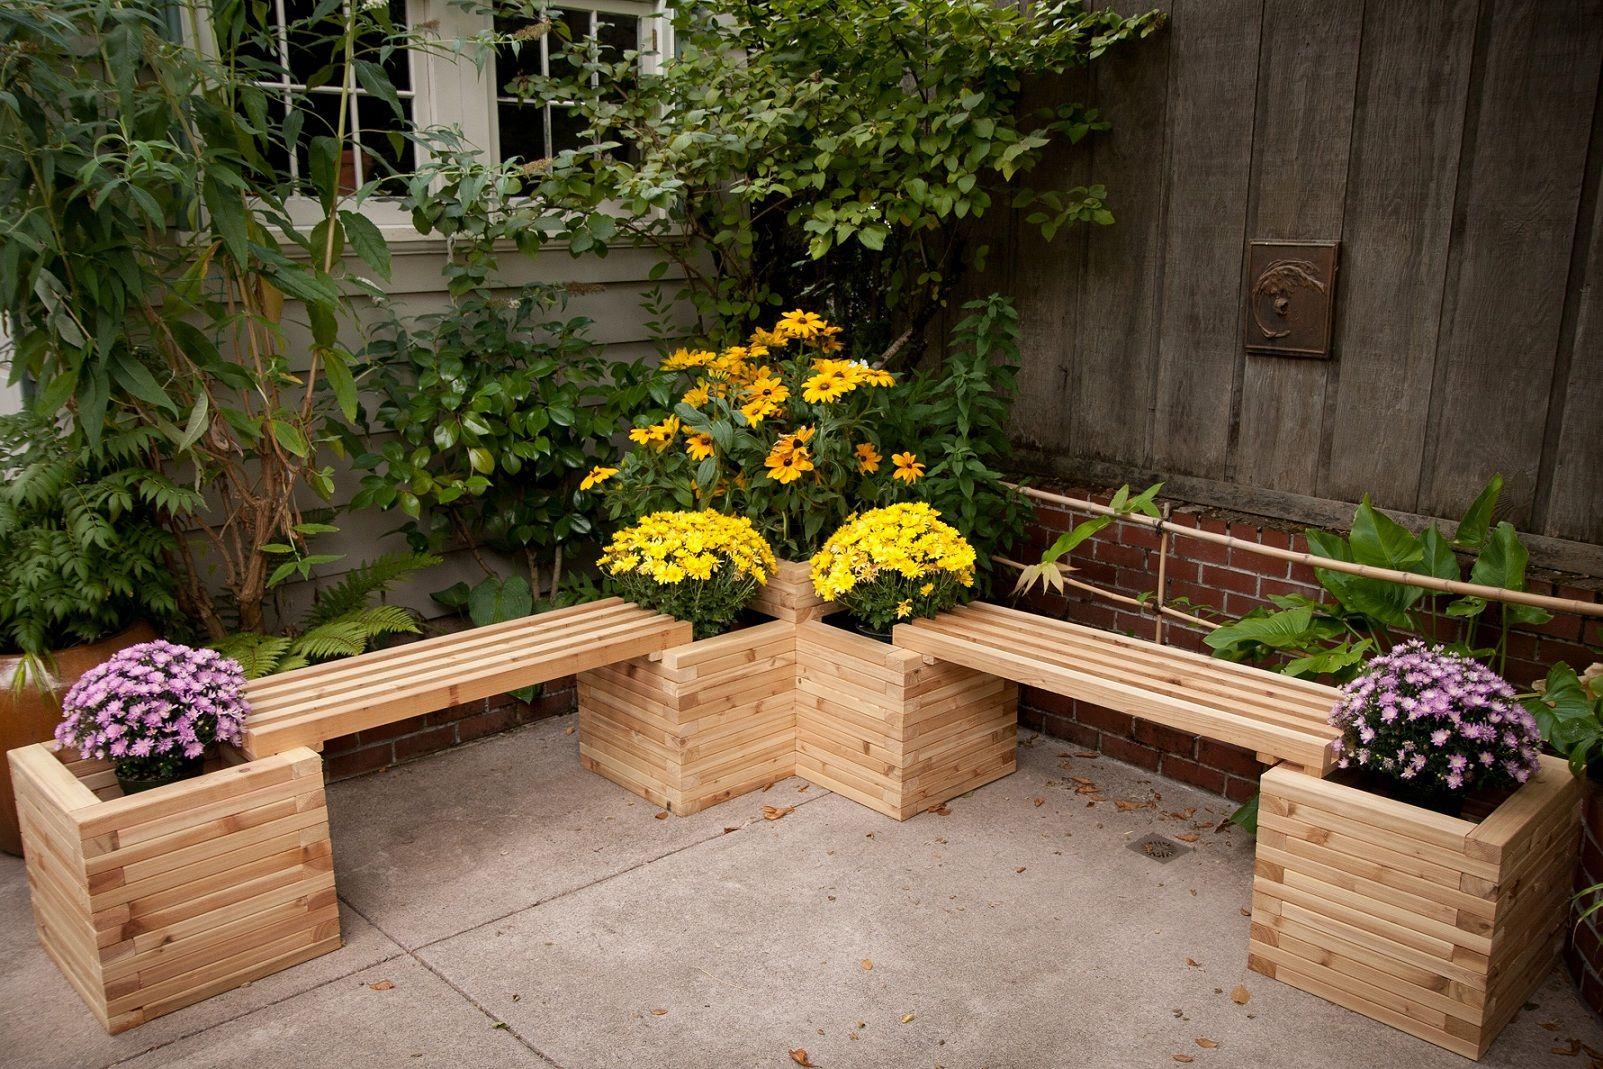 17 Fascinating Diy Seating Elements To Enhance Your Outdoor ... destiné Petit Banc De Jardin